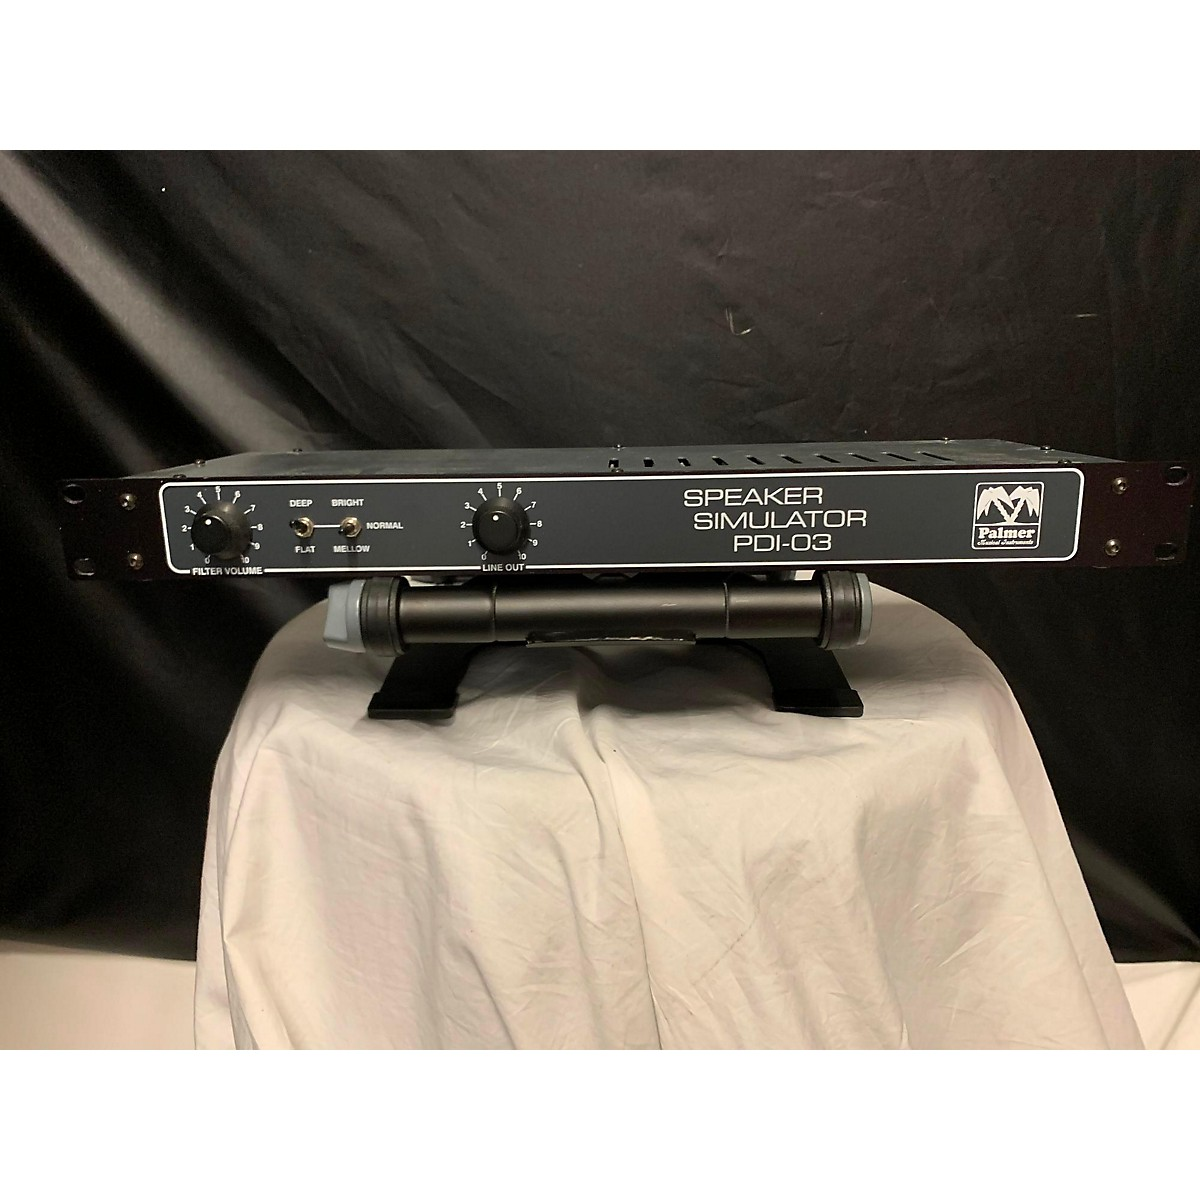 Palmer PDI03 Direct Box